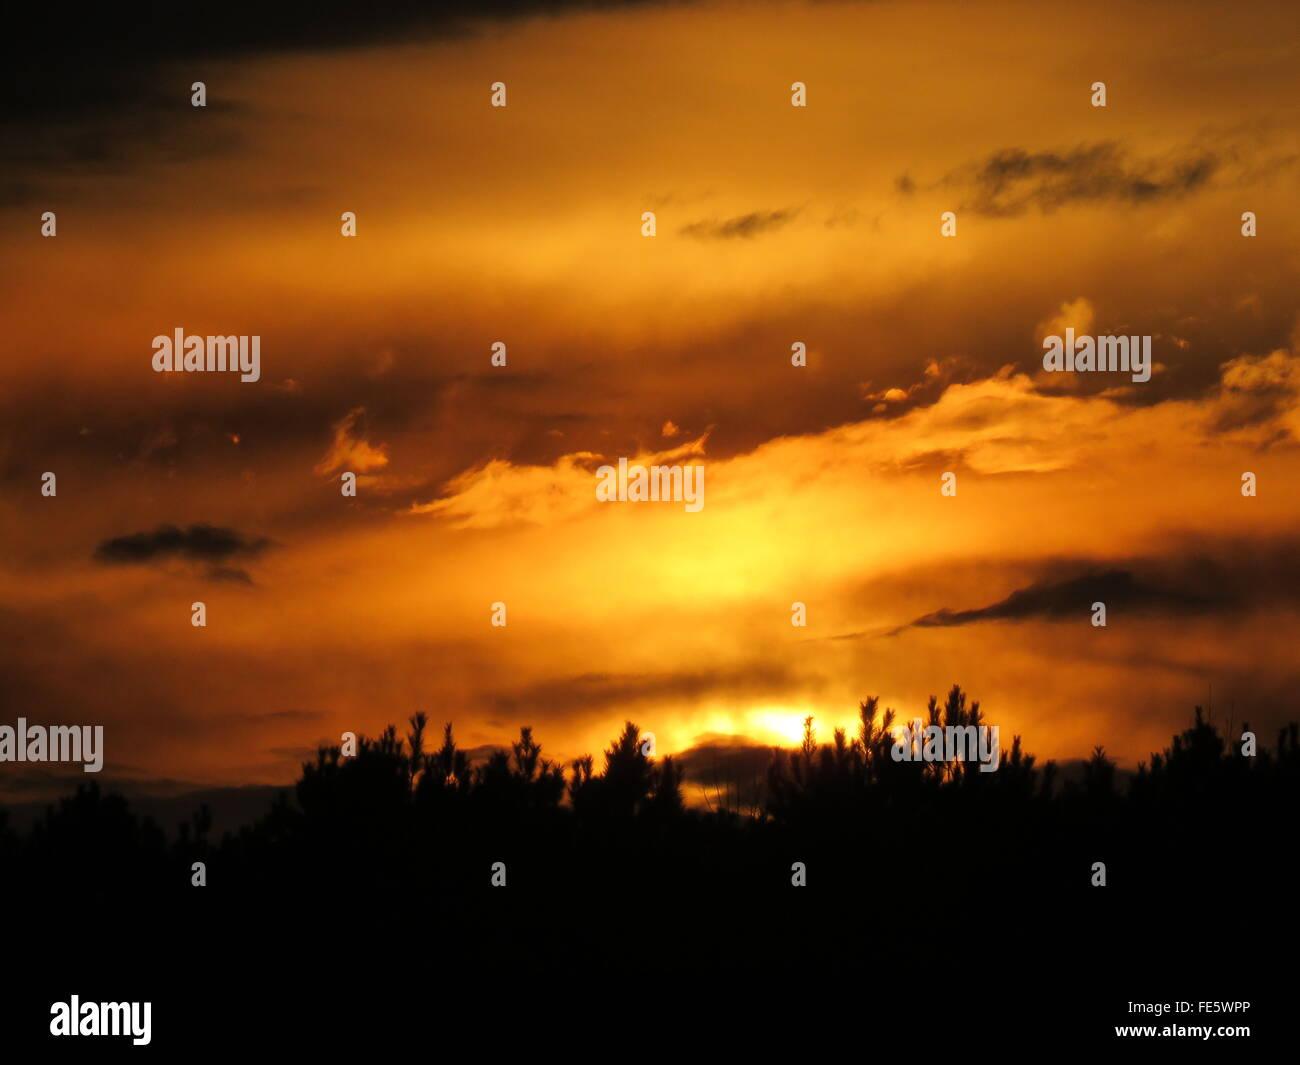 Idyllic View Of Dramatic Sky During Sunset - Stock Image